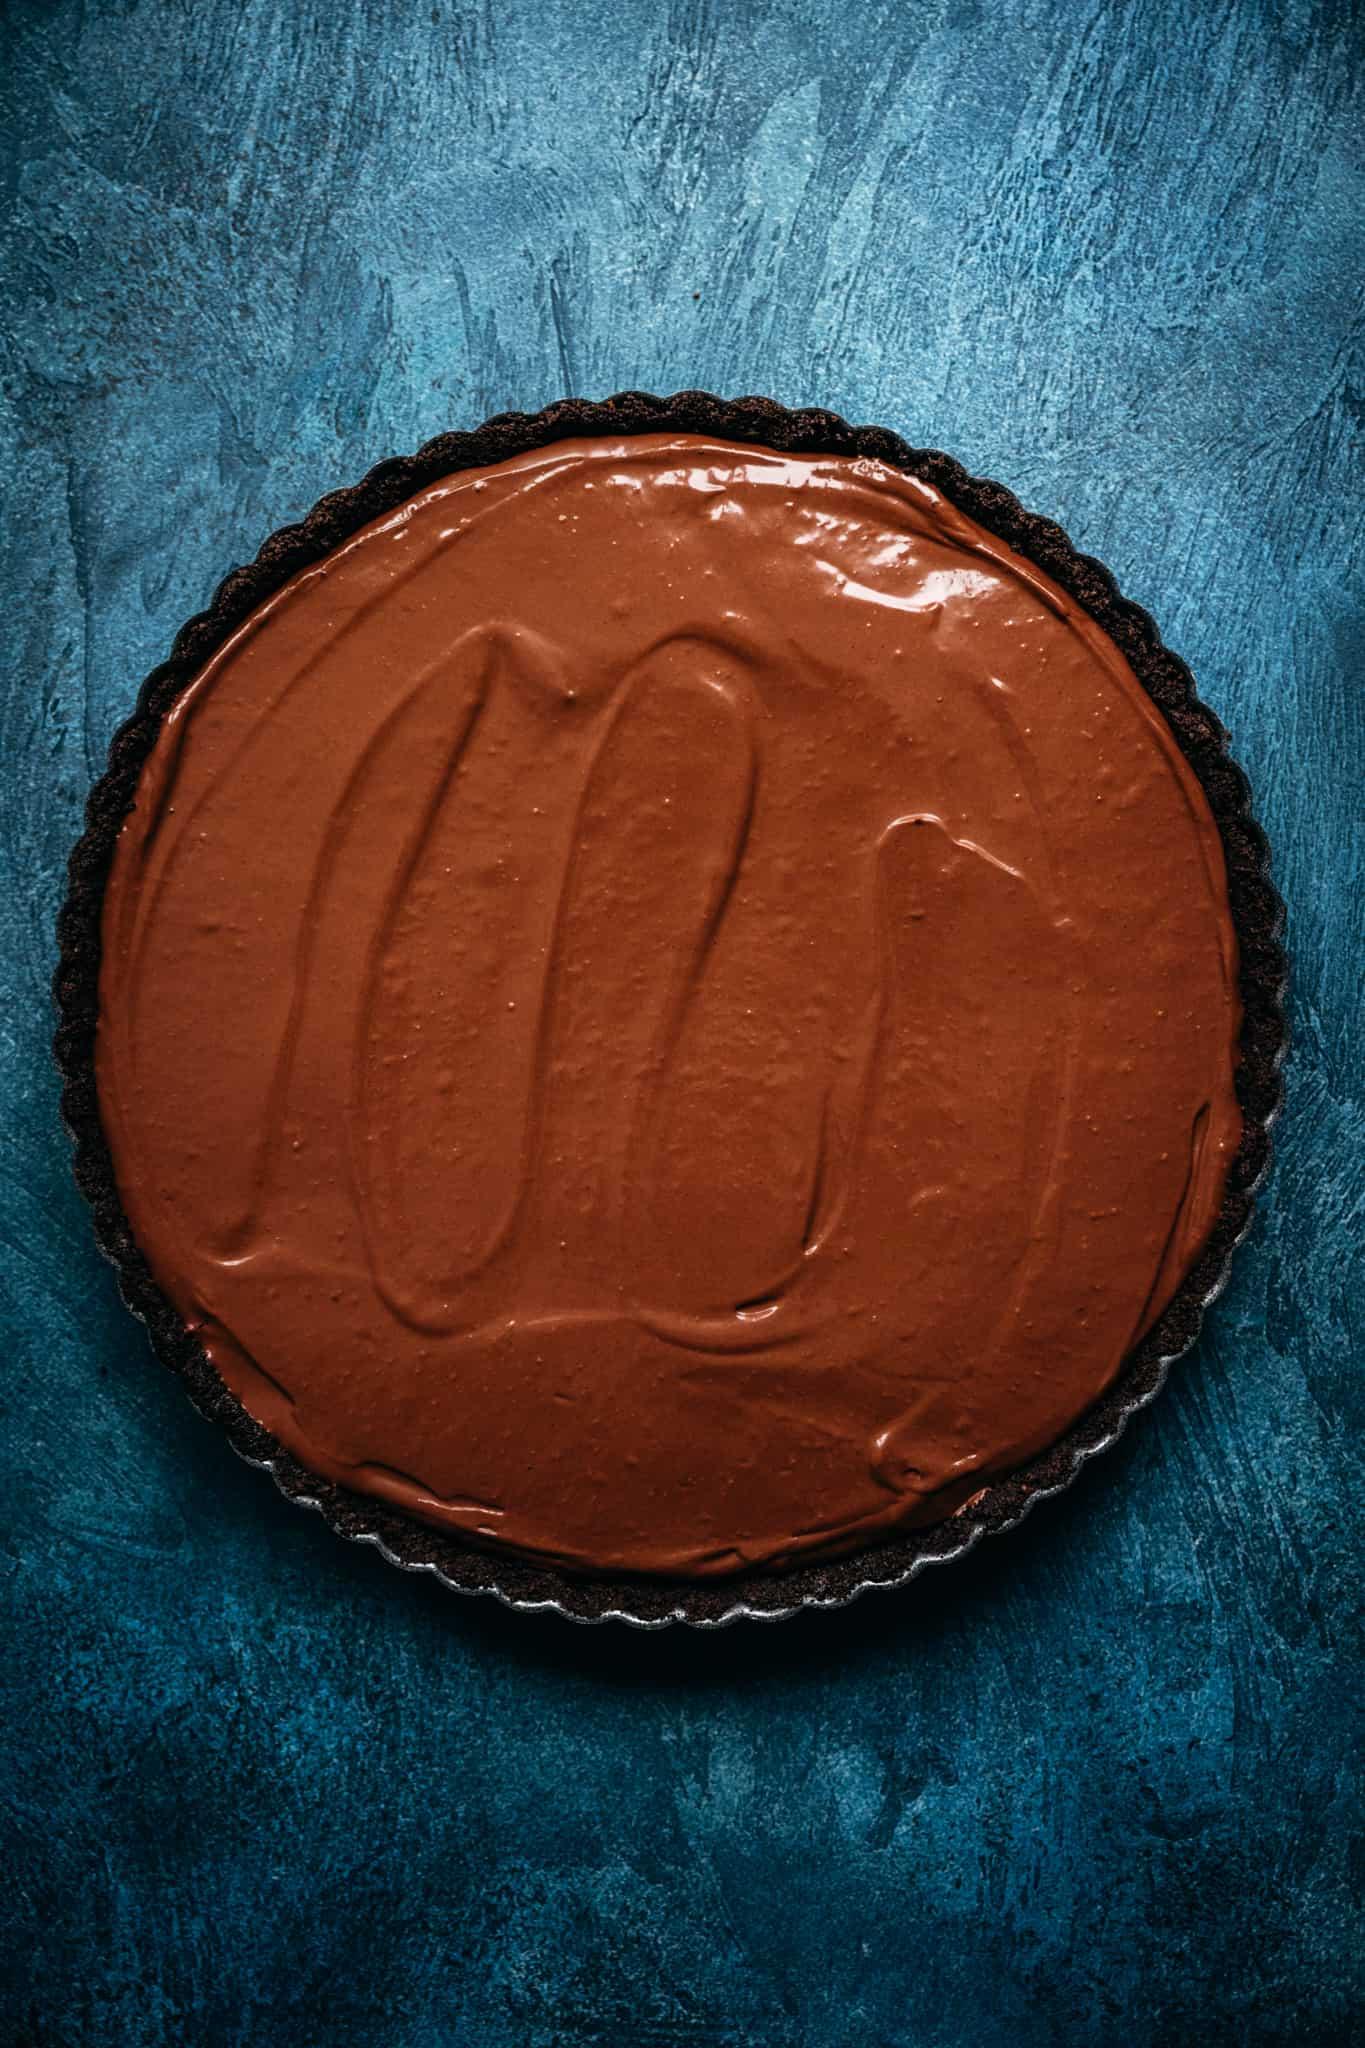 overhead view of chocolate tart